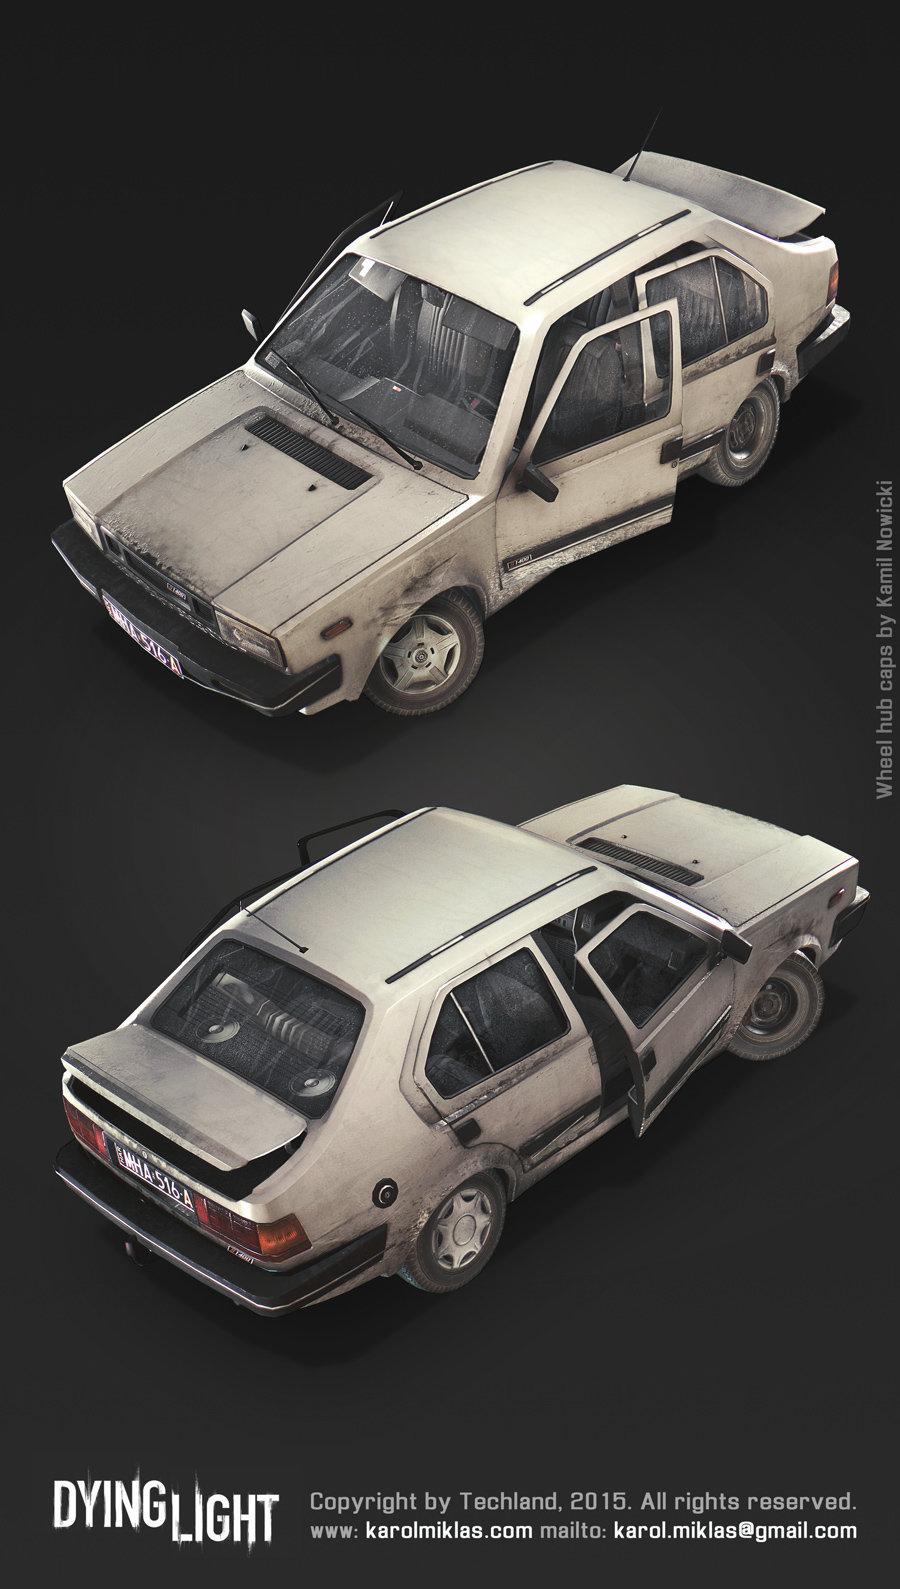 karol-miklas-new-sedan-b-1.jpg